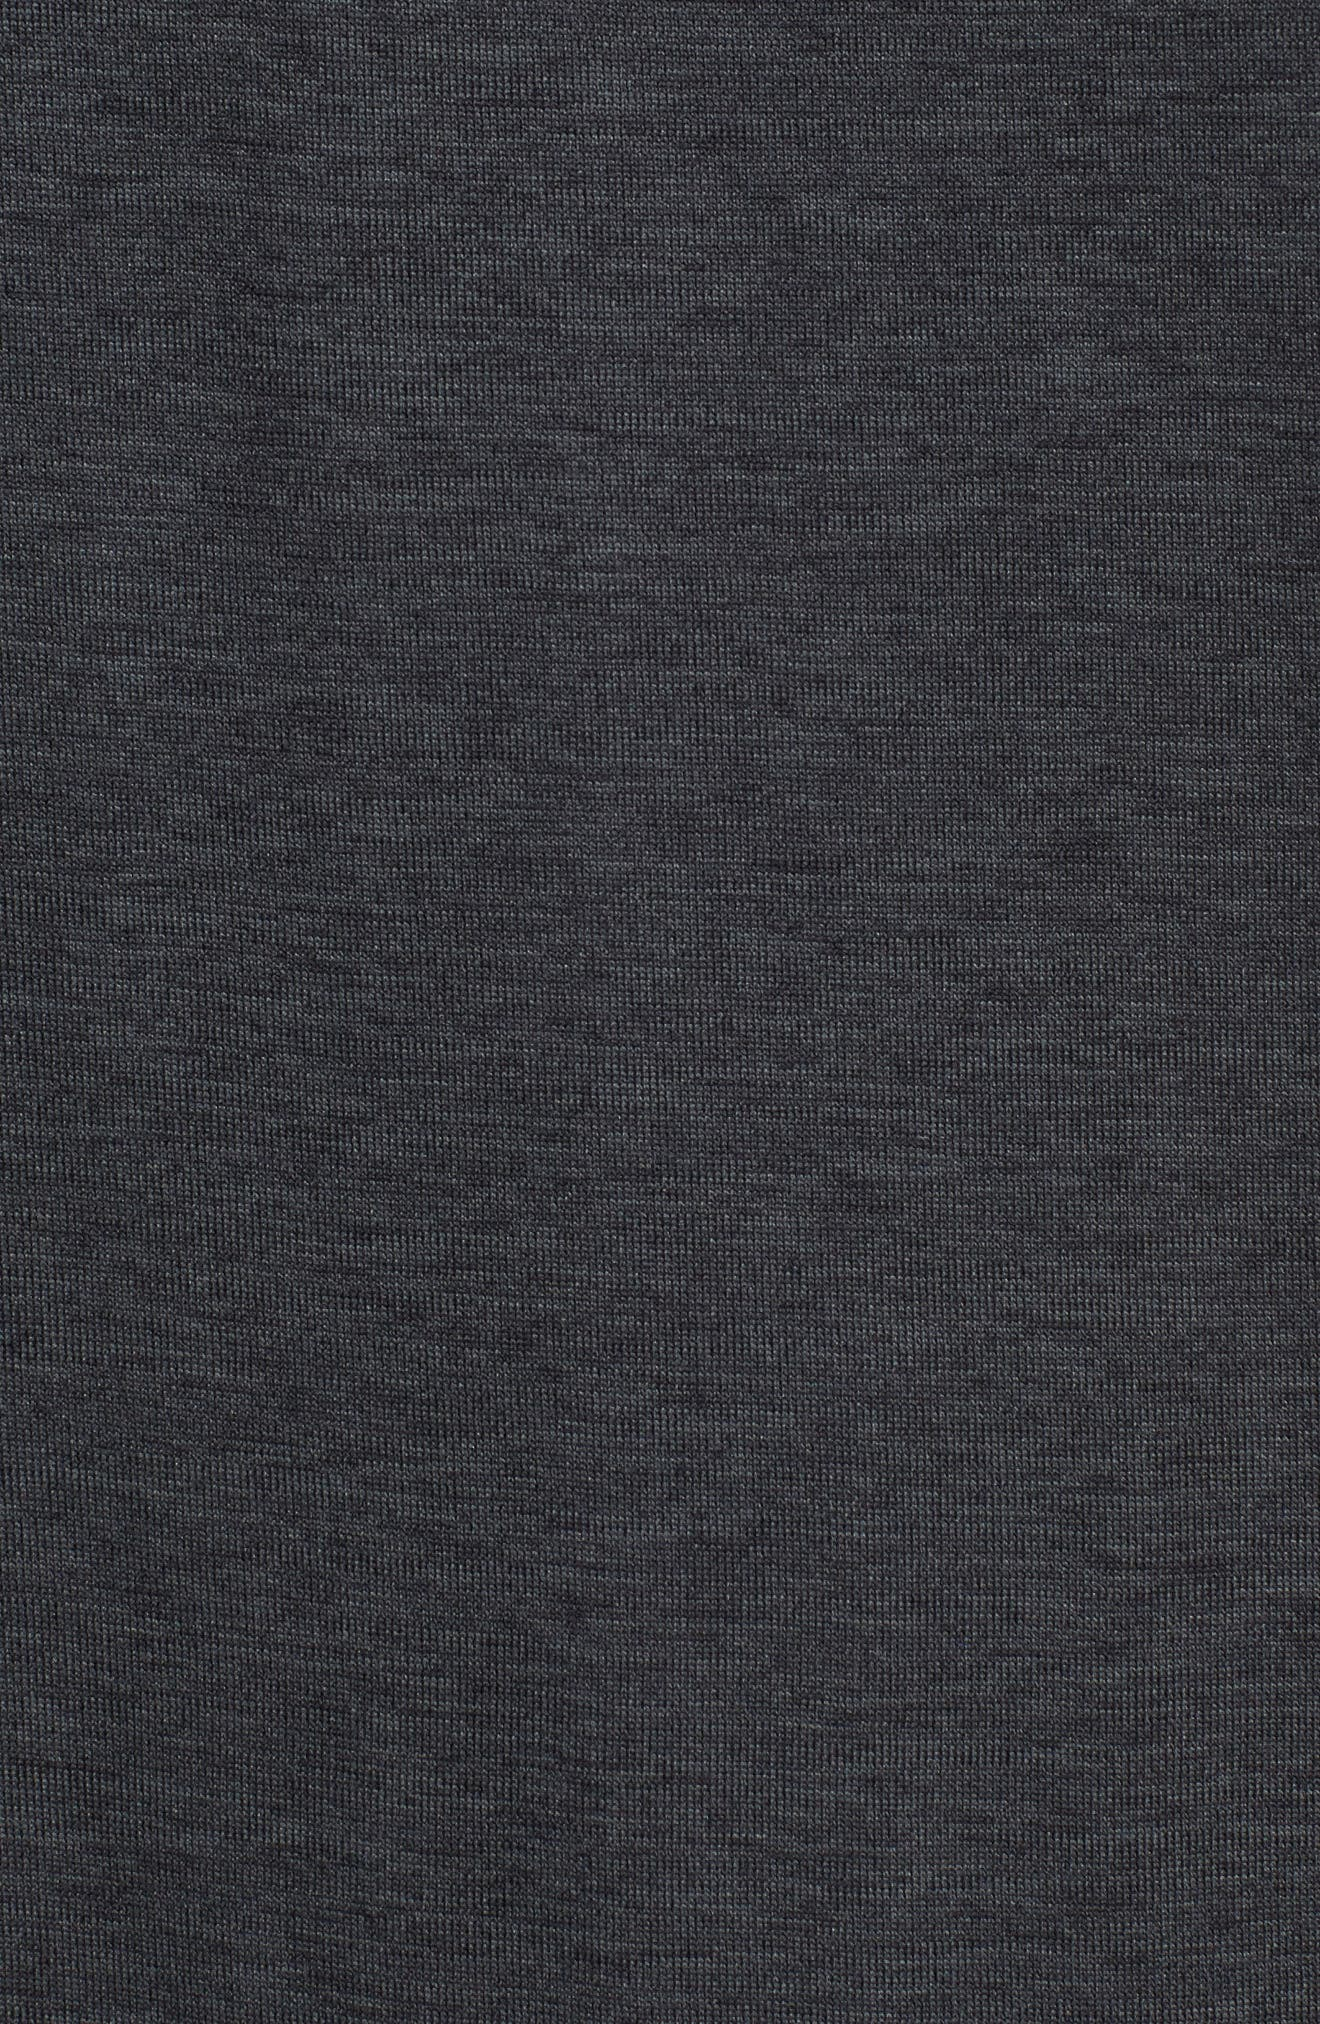 Long Sleeve Training T-Shirt,                             Alternate thumbnail 5, color,                             010